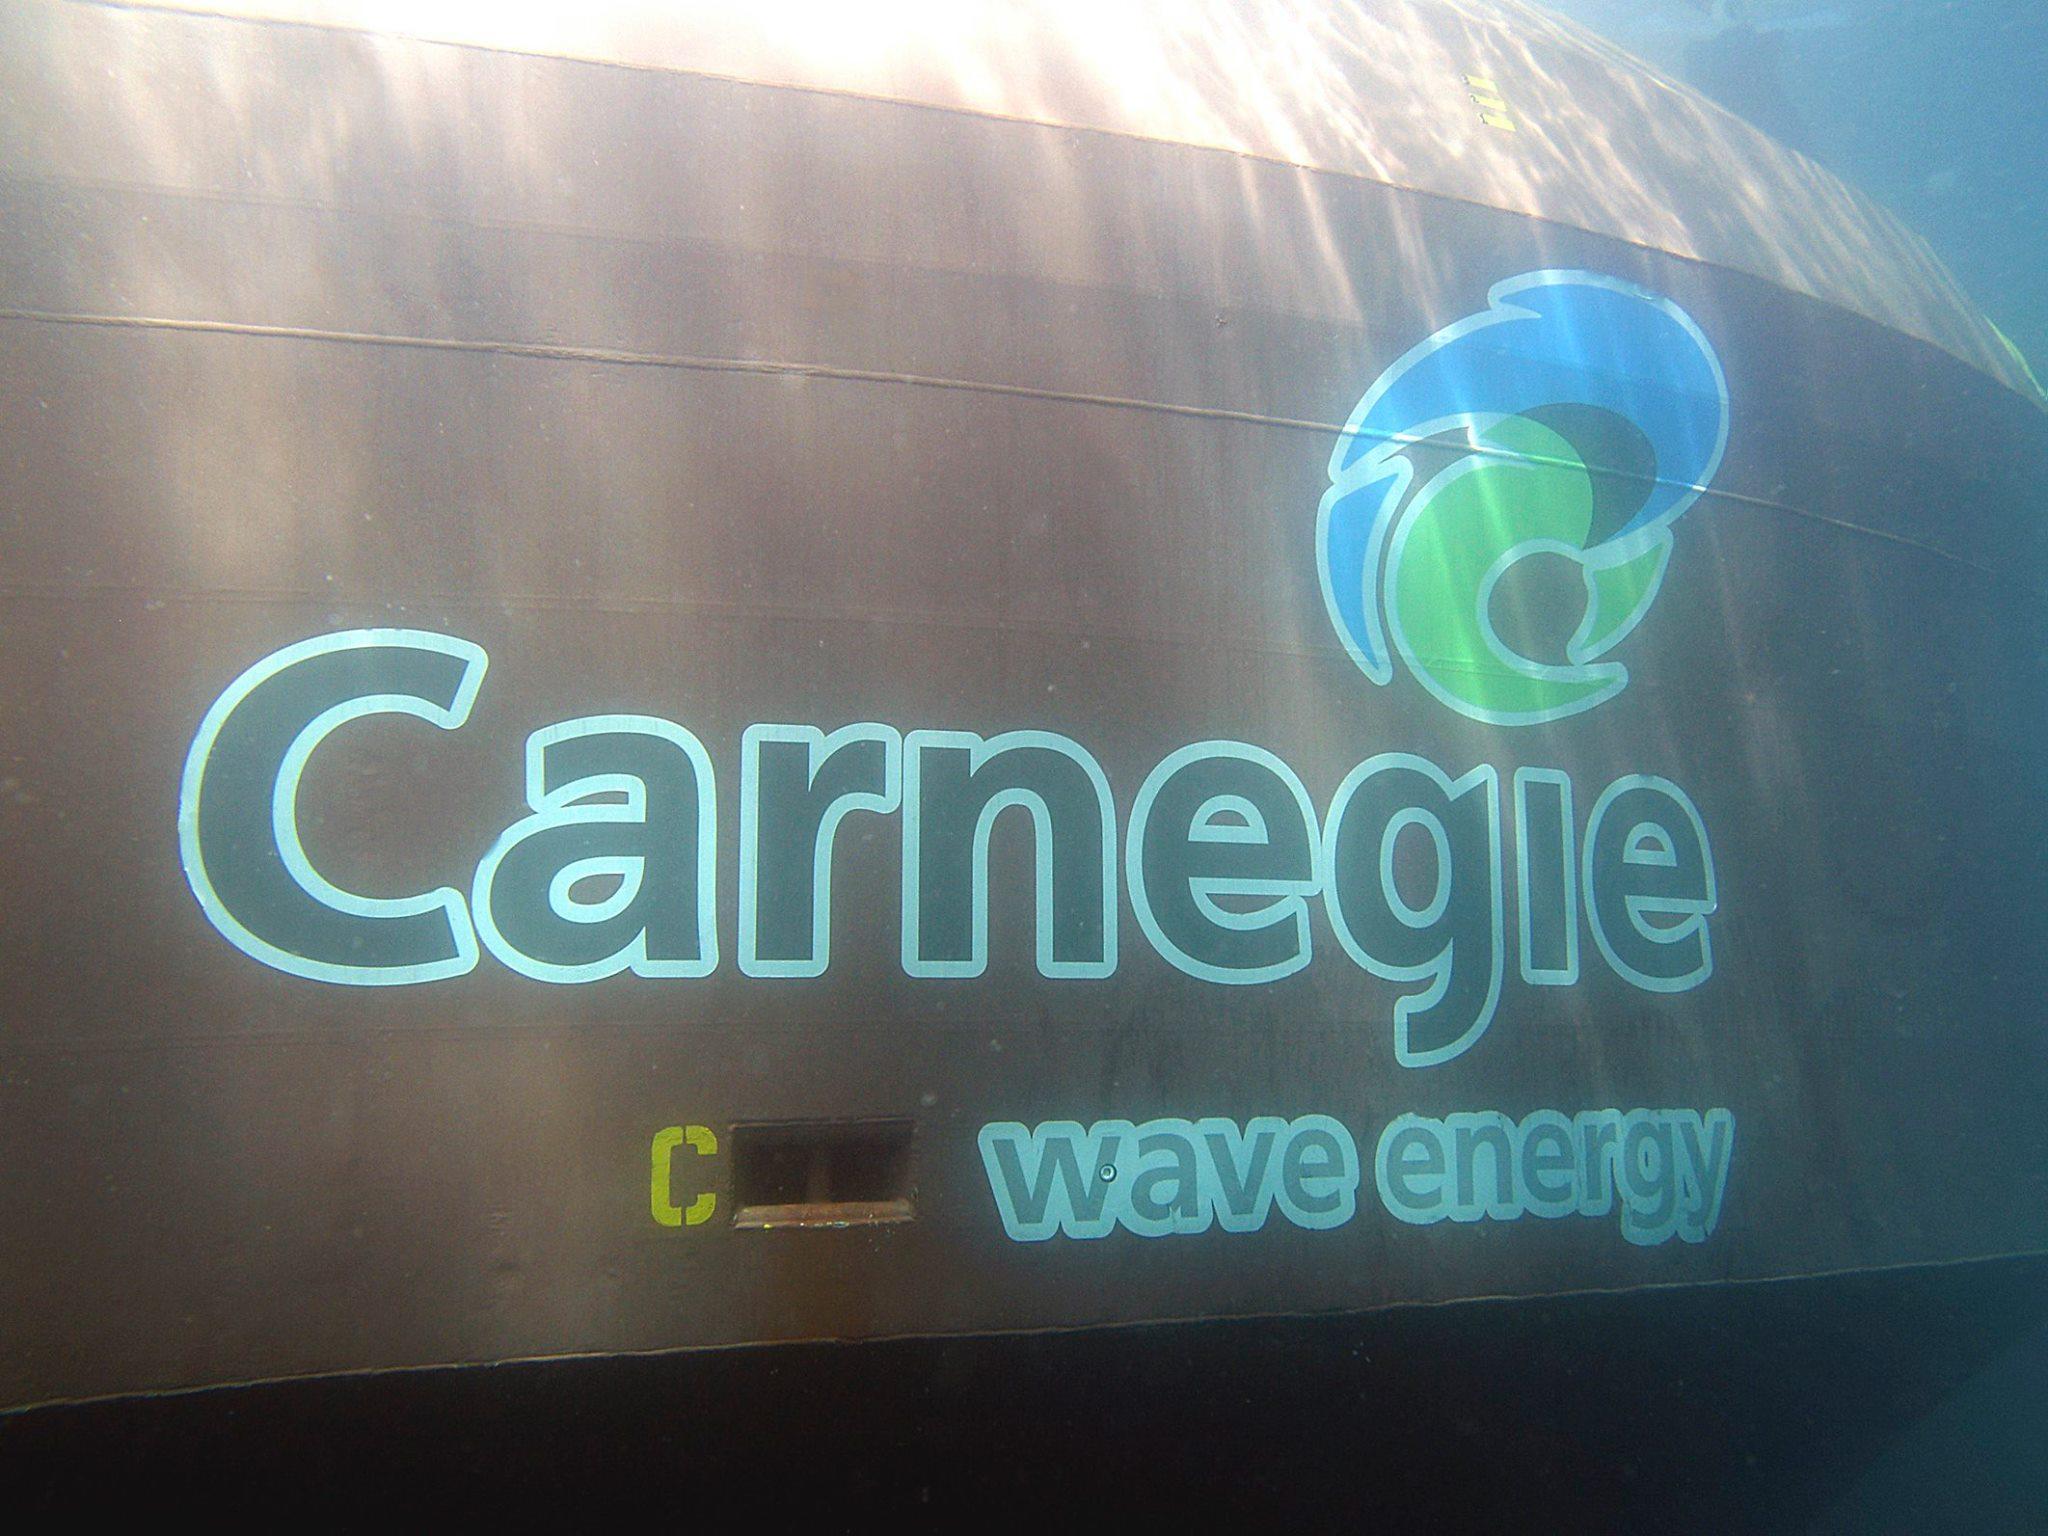 Carnegie wave energy boje_energy-mag